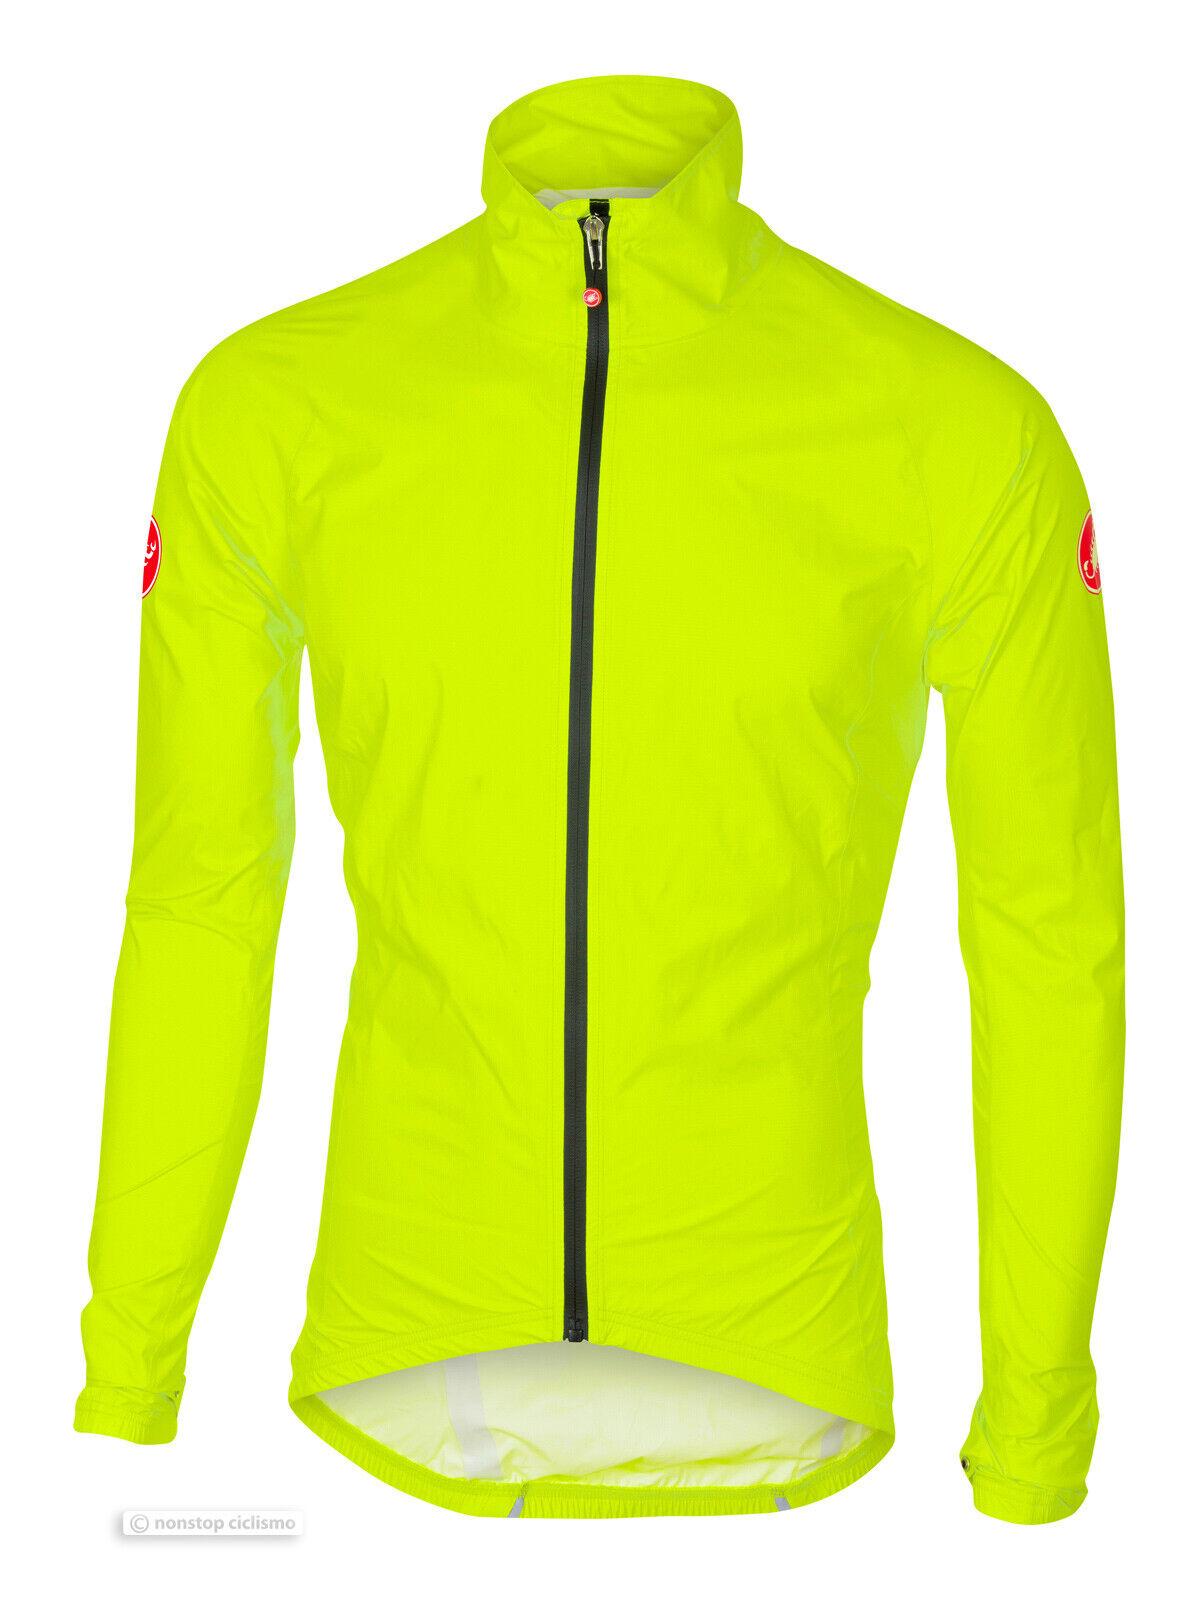 Castelli Emergencia Chubasquero  Ciclismo Prueba Viento   Shell  Amarillo Fluo  alto descuento